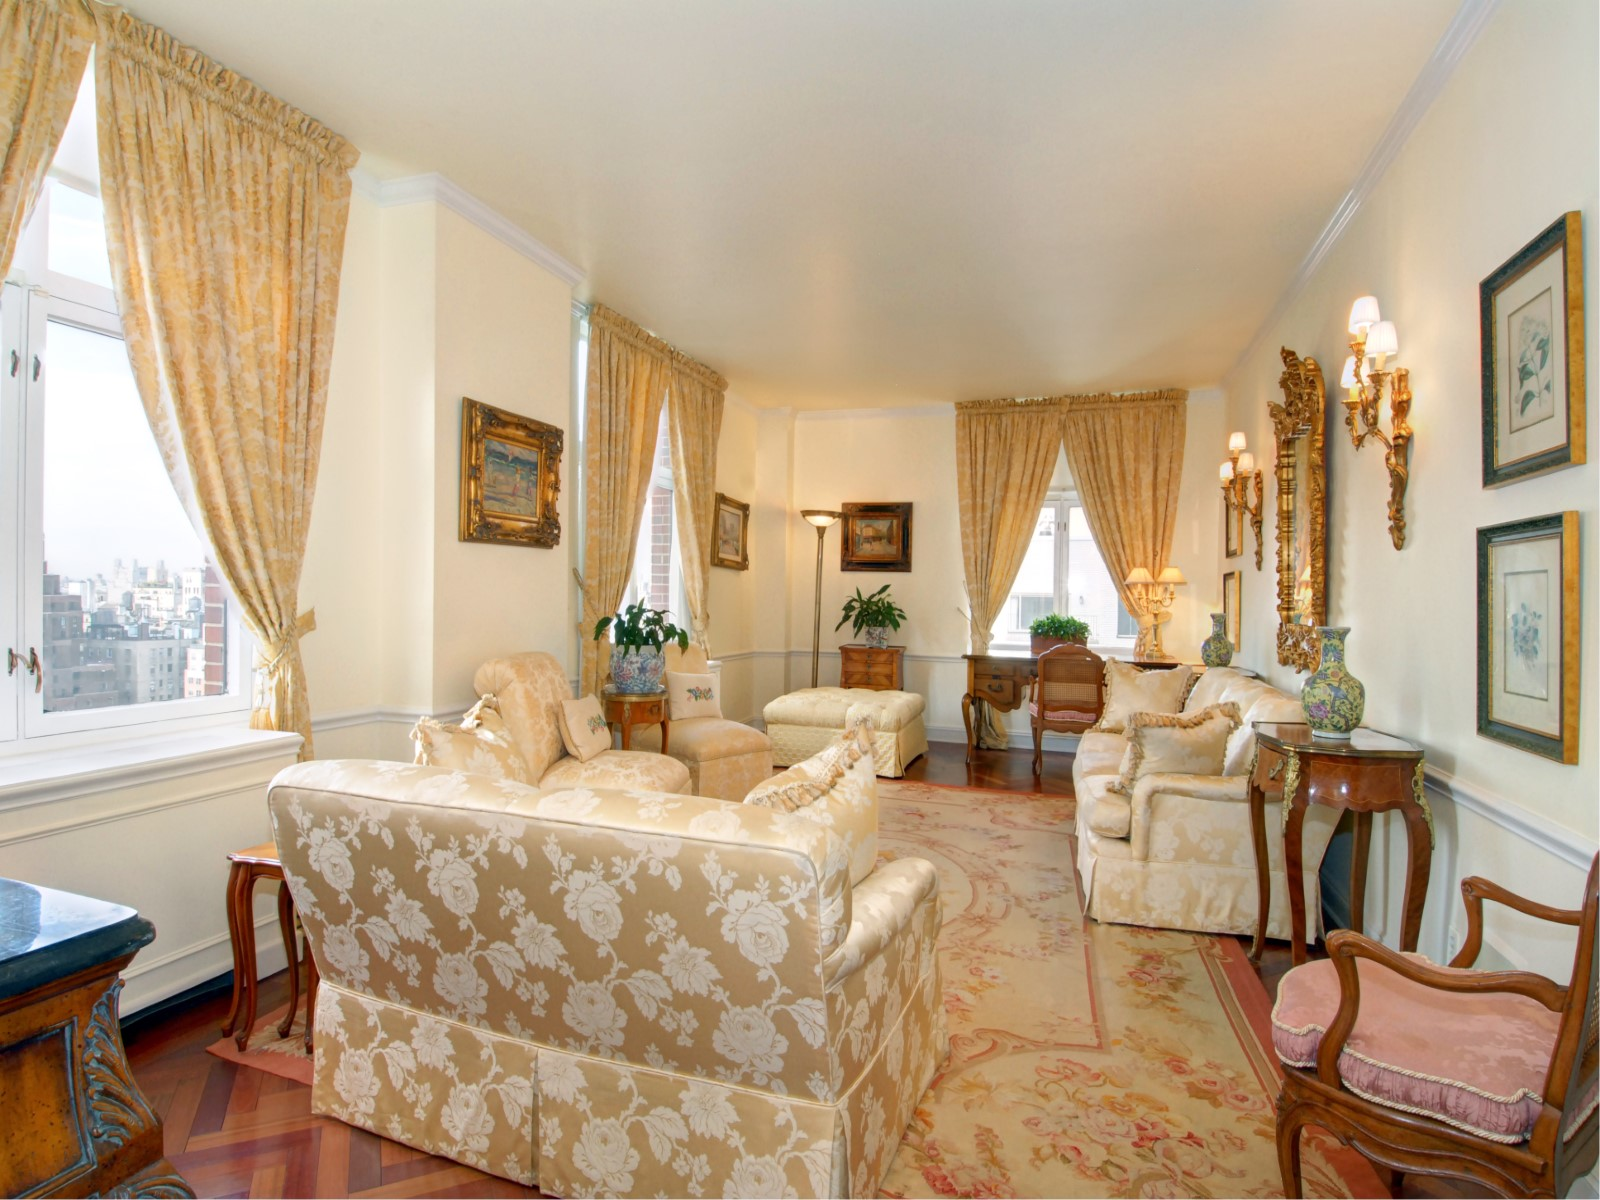 共管式独立产权公寓 为 销售 在 The Trafalgar House 188 East 70th Street Apt 19c Upper East Side, New York, 纽约州 10021 美国